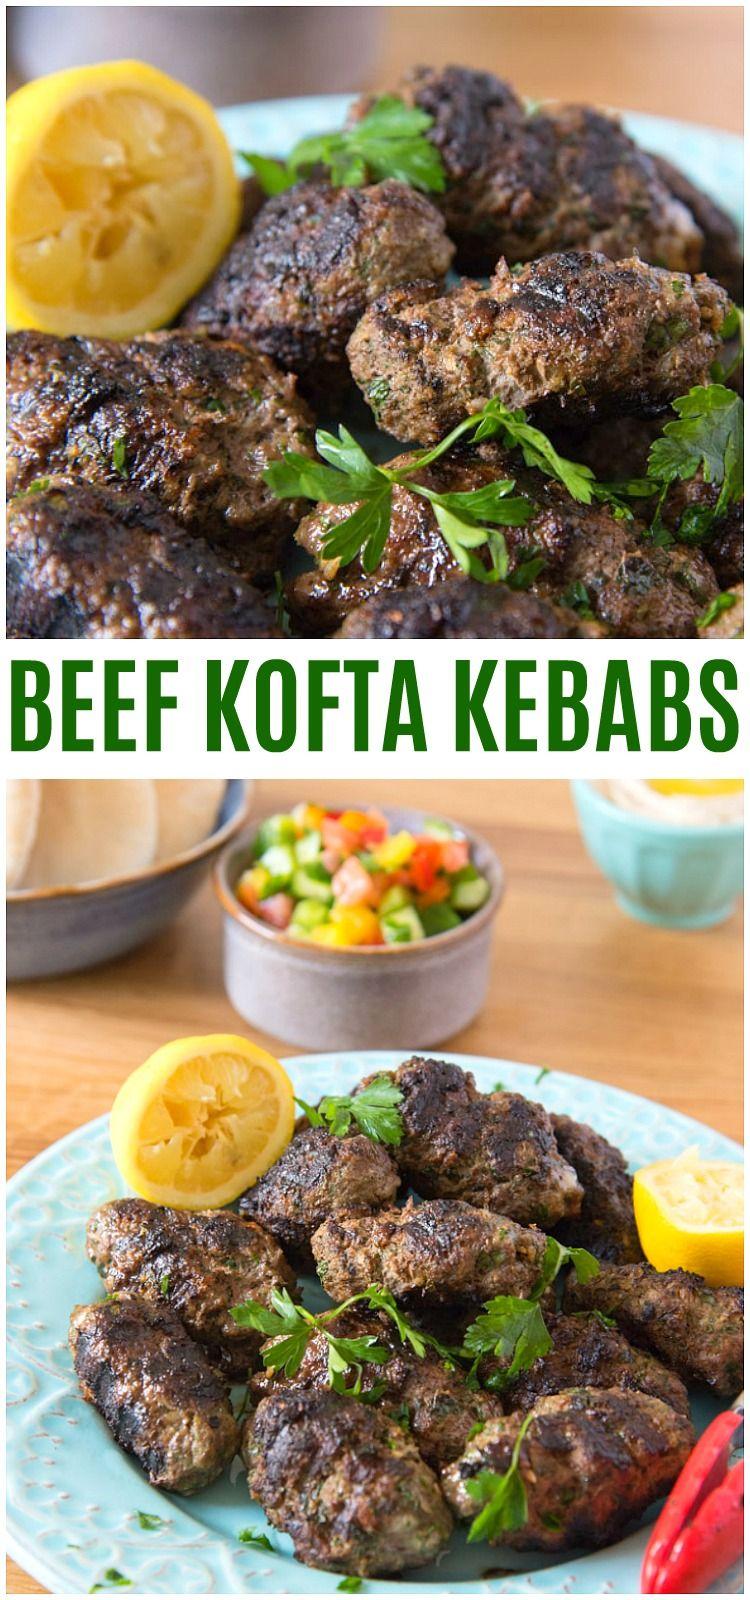 Beef Kofta Recipe Mediterranean Ground Beef Kabob Recipe Via Knowyourproduce Paleo Beef Appetizer Beef Kofta Recipe Kofta Recipe Ground Beef Kabob Recipe